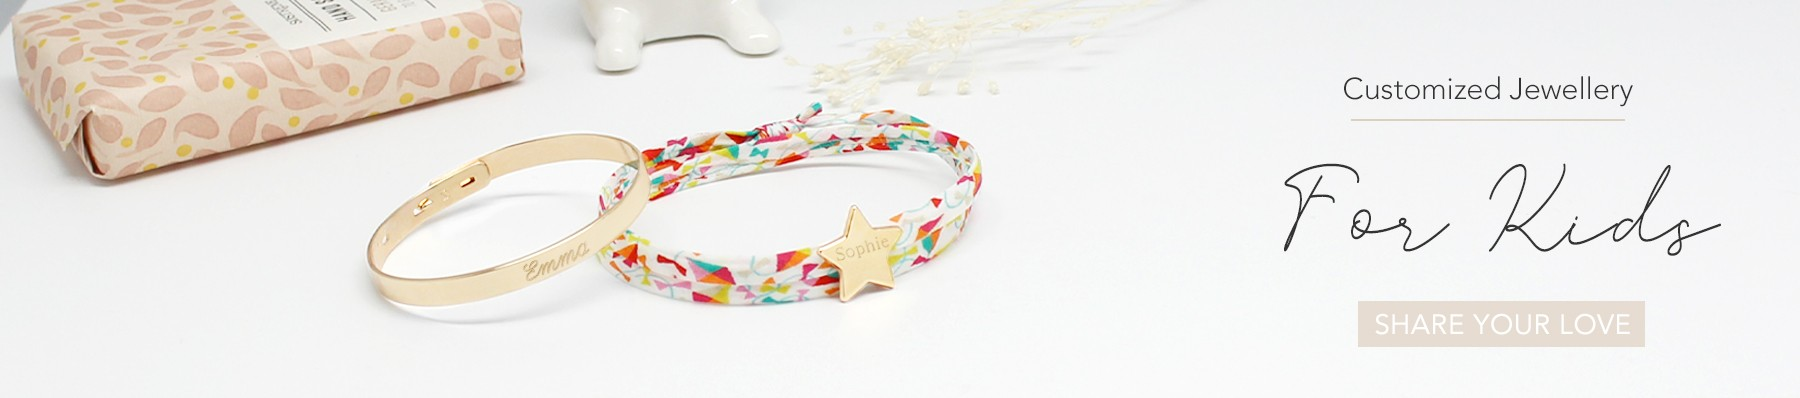 Customized jewellery for kids